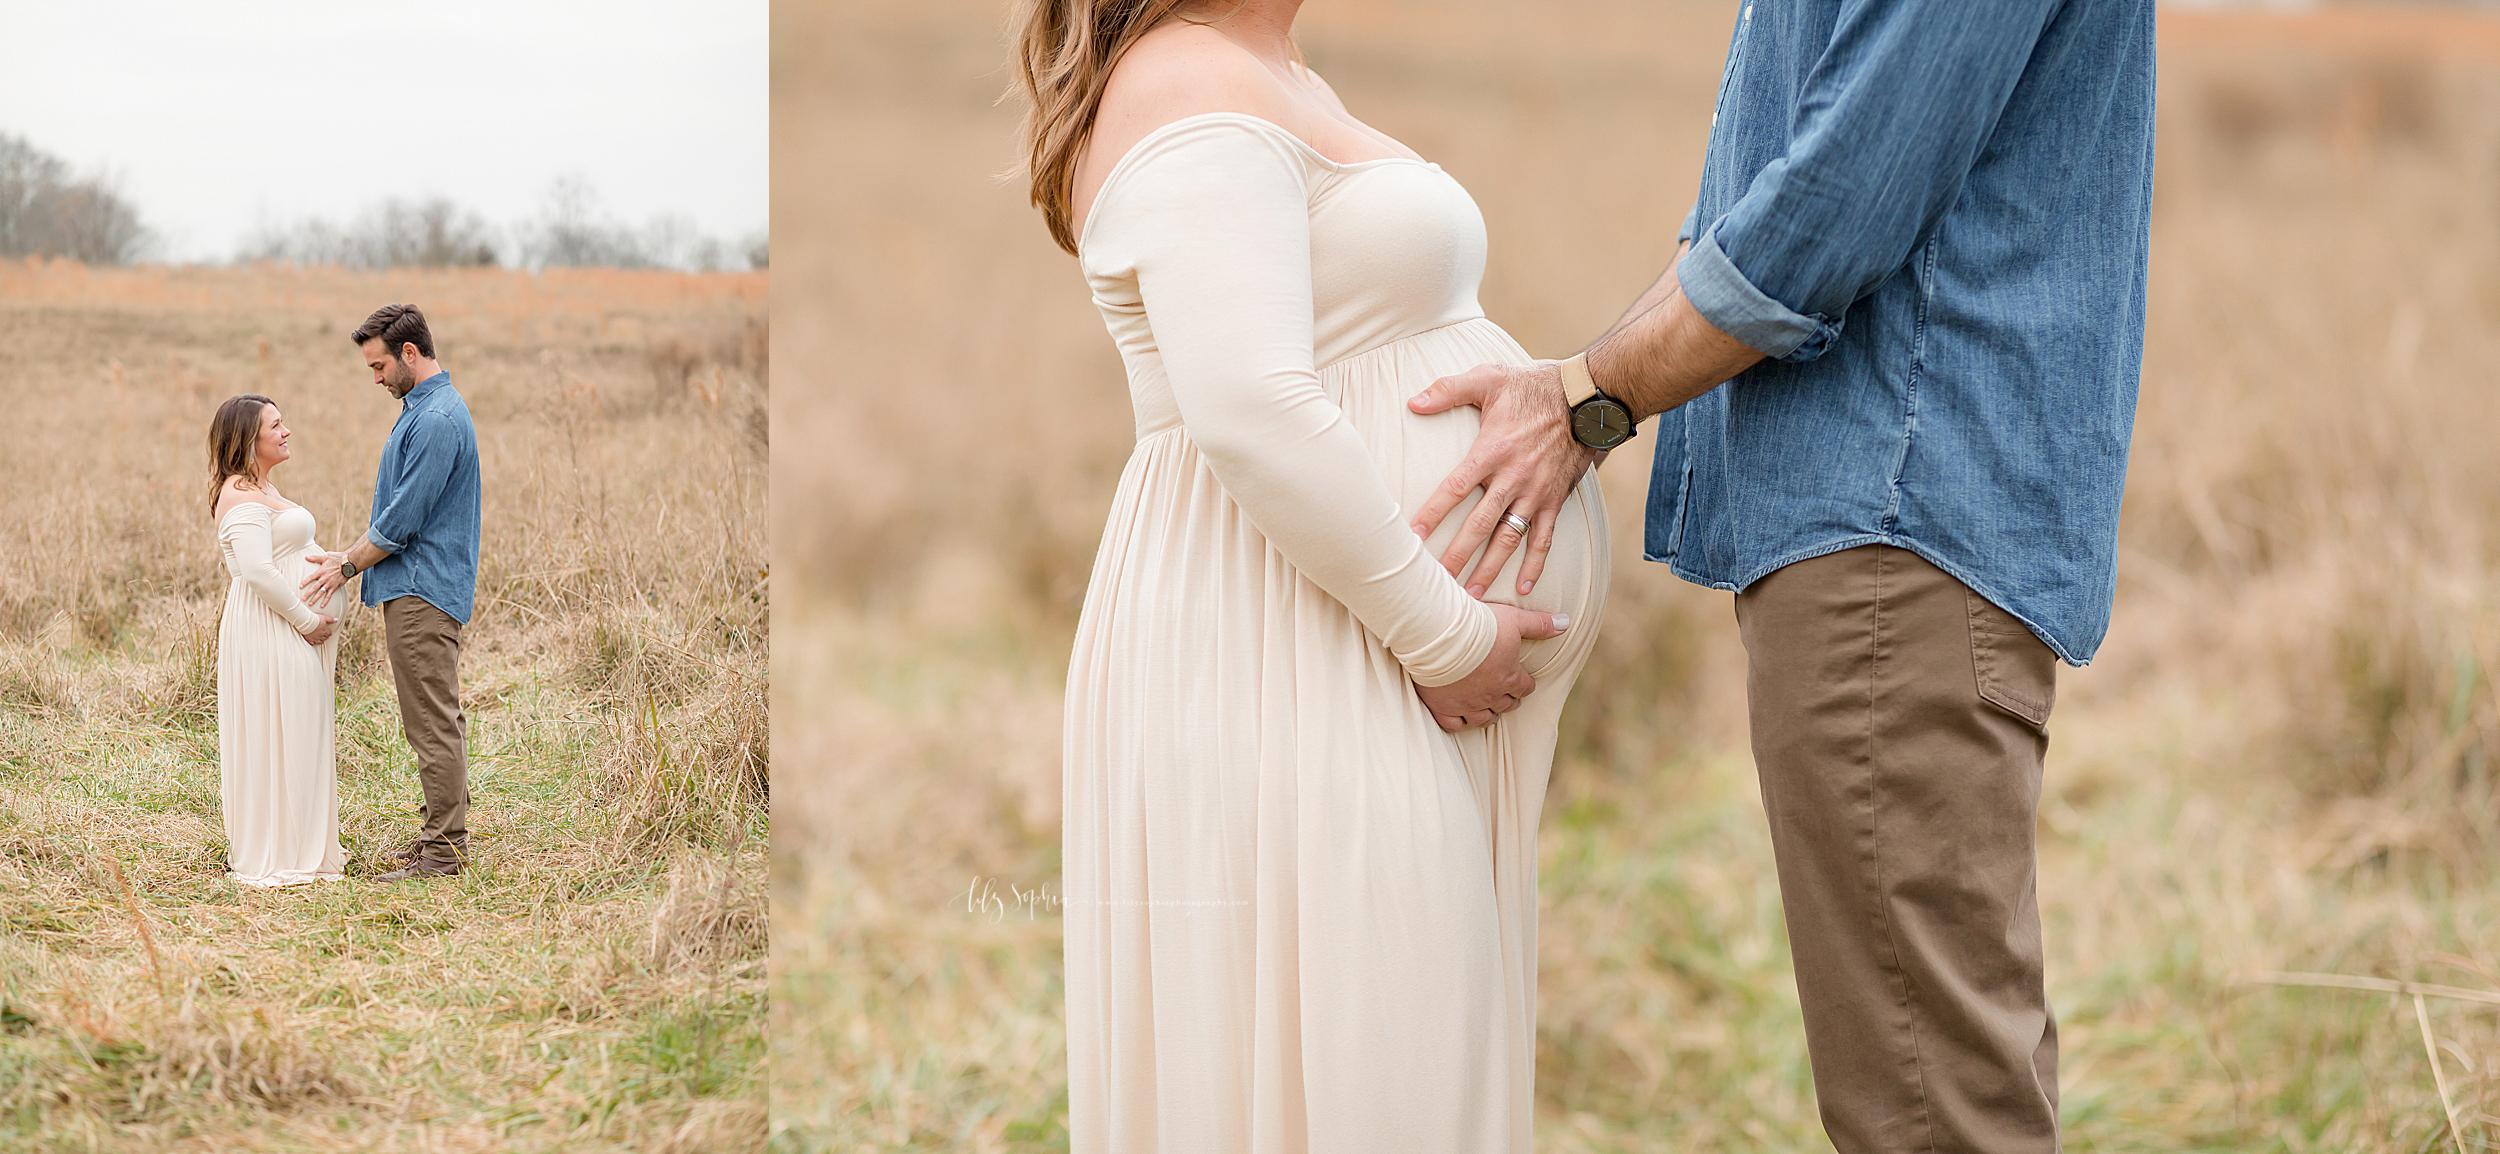 atlanta-cumming-brookhaven-alpharetta-virginia-highlands-roswell-decatur-lily-sophia-photography-outdoor-field-sunset-couples-maternity-photos_0690.jpg